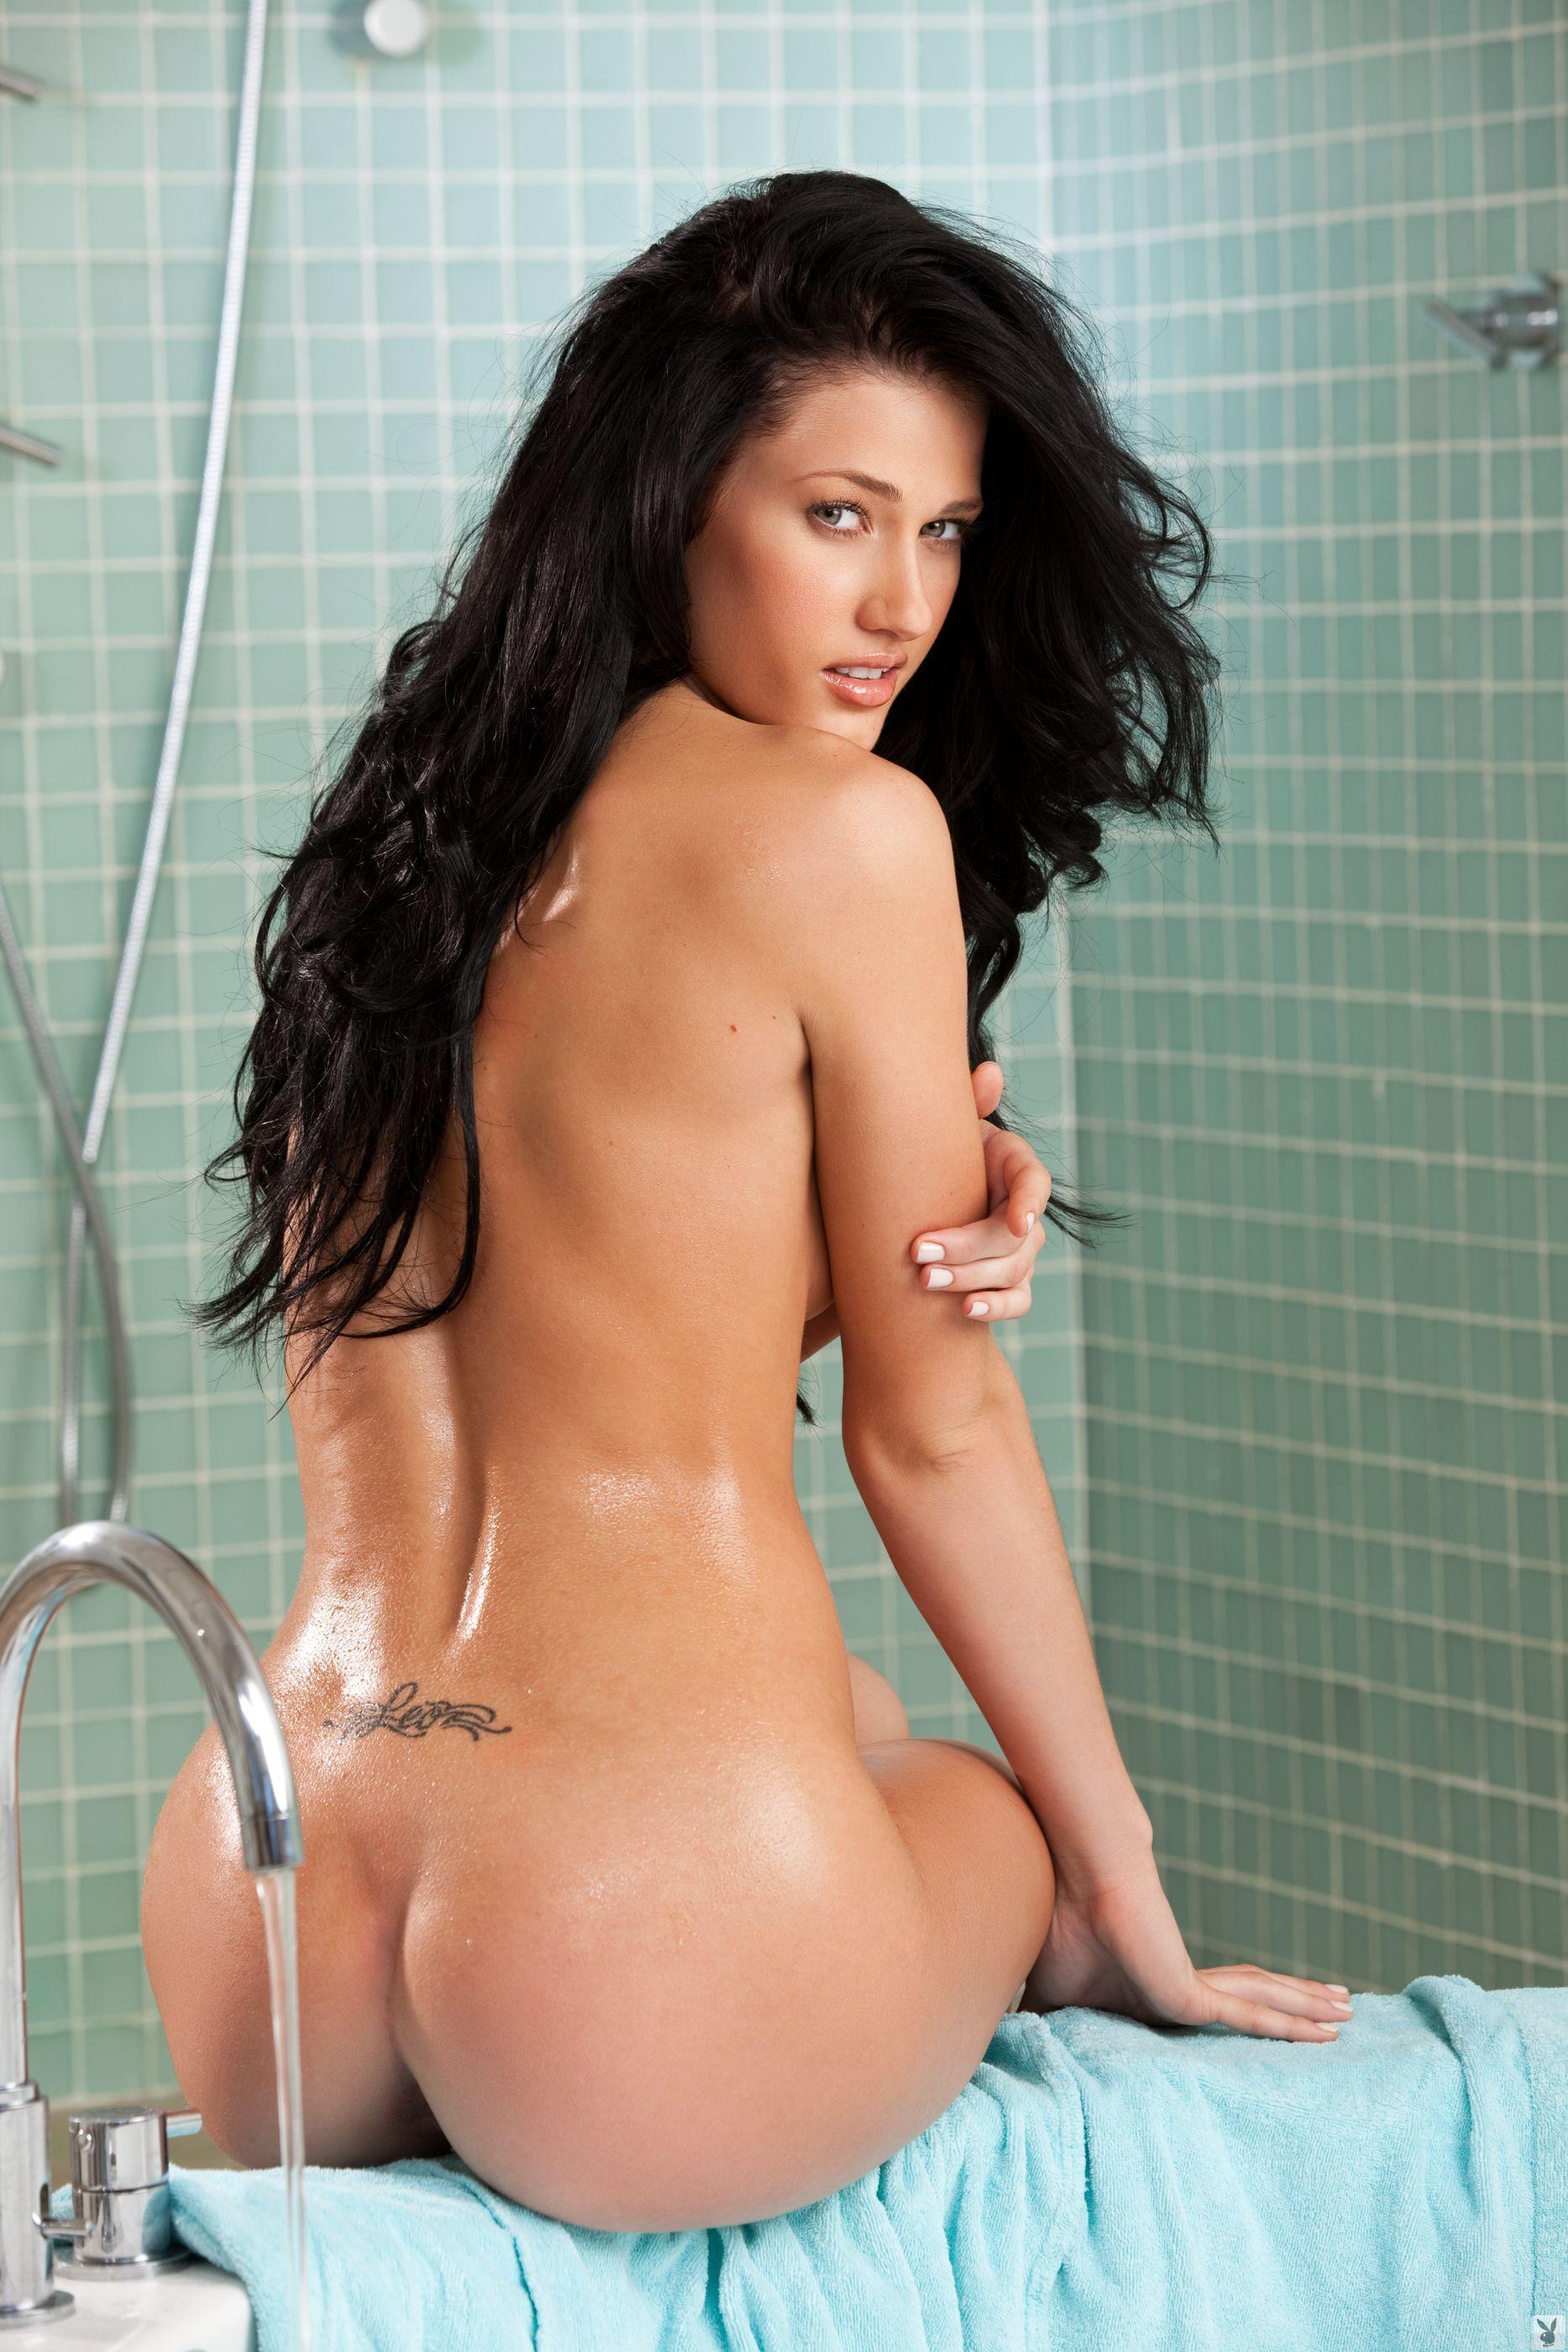 ashton-winters-brunette-nude-bathroom-playboy-32